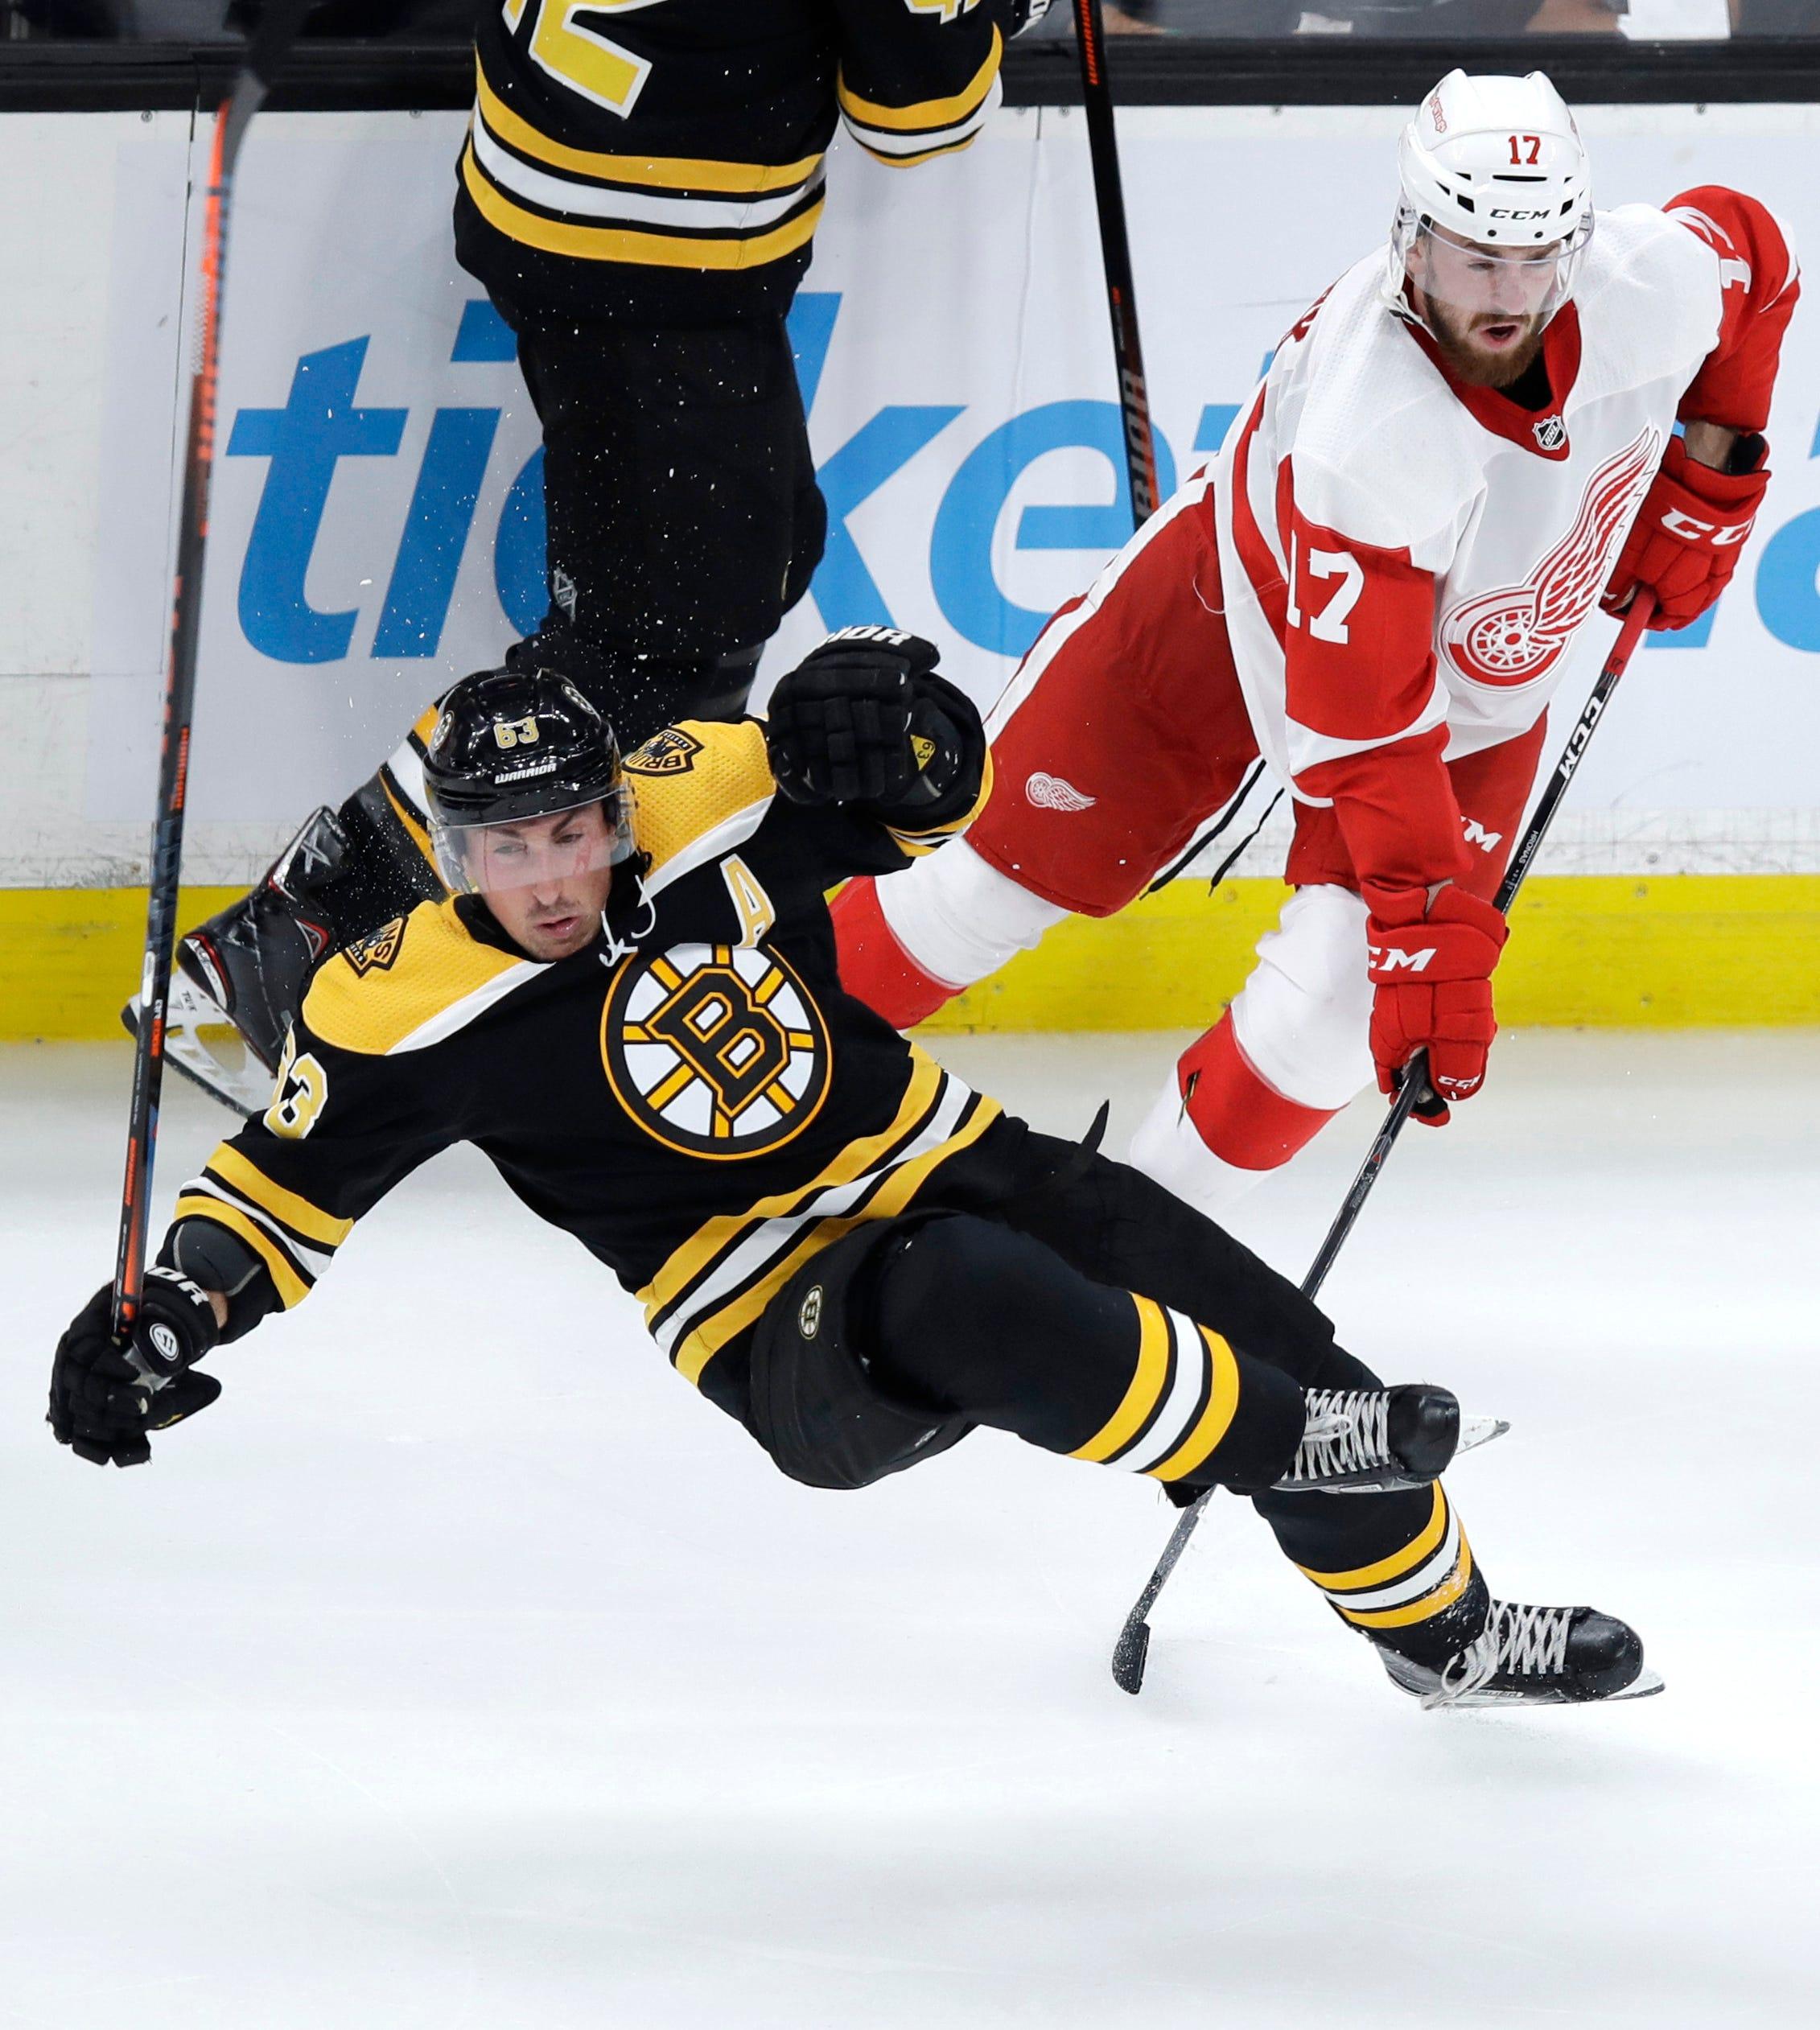 Phil Kessel scores twice, Penguins beat Sabres 5-1